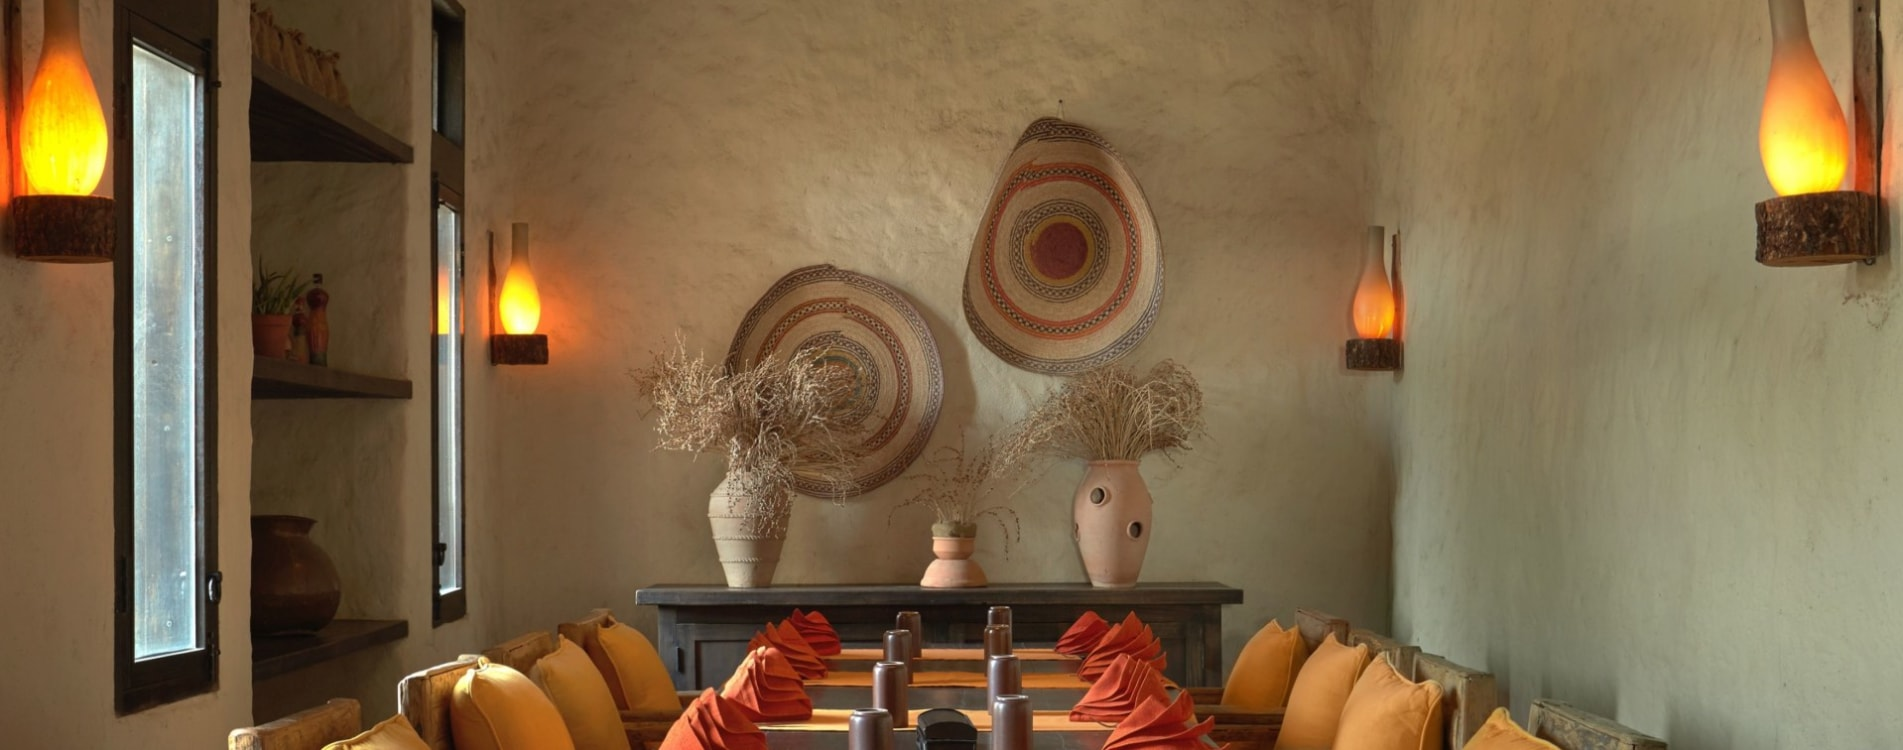 Six-Senses-Zighy-Bay-Chefs-Table-Spice-Market-Restaurant-Oman.jpg